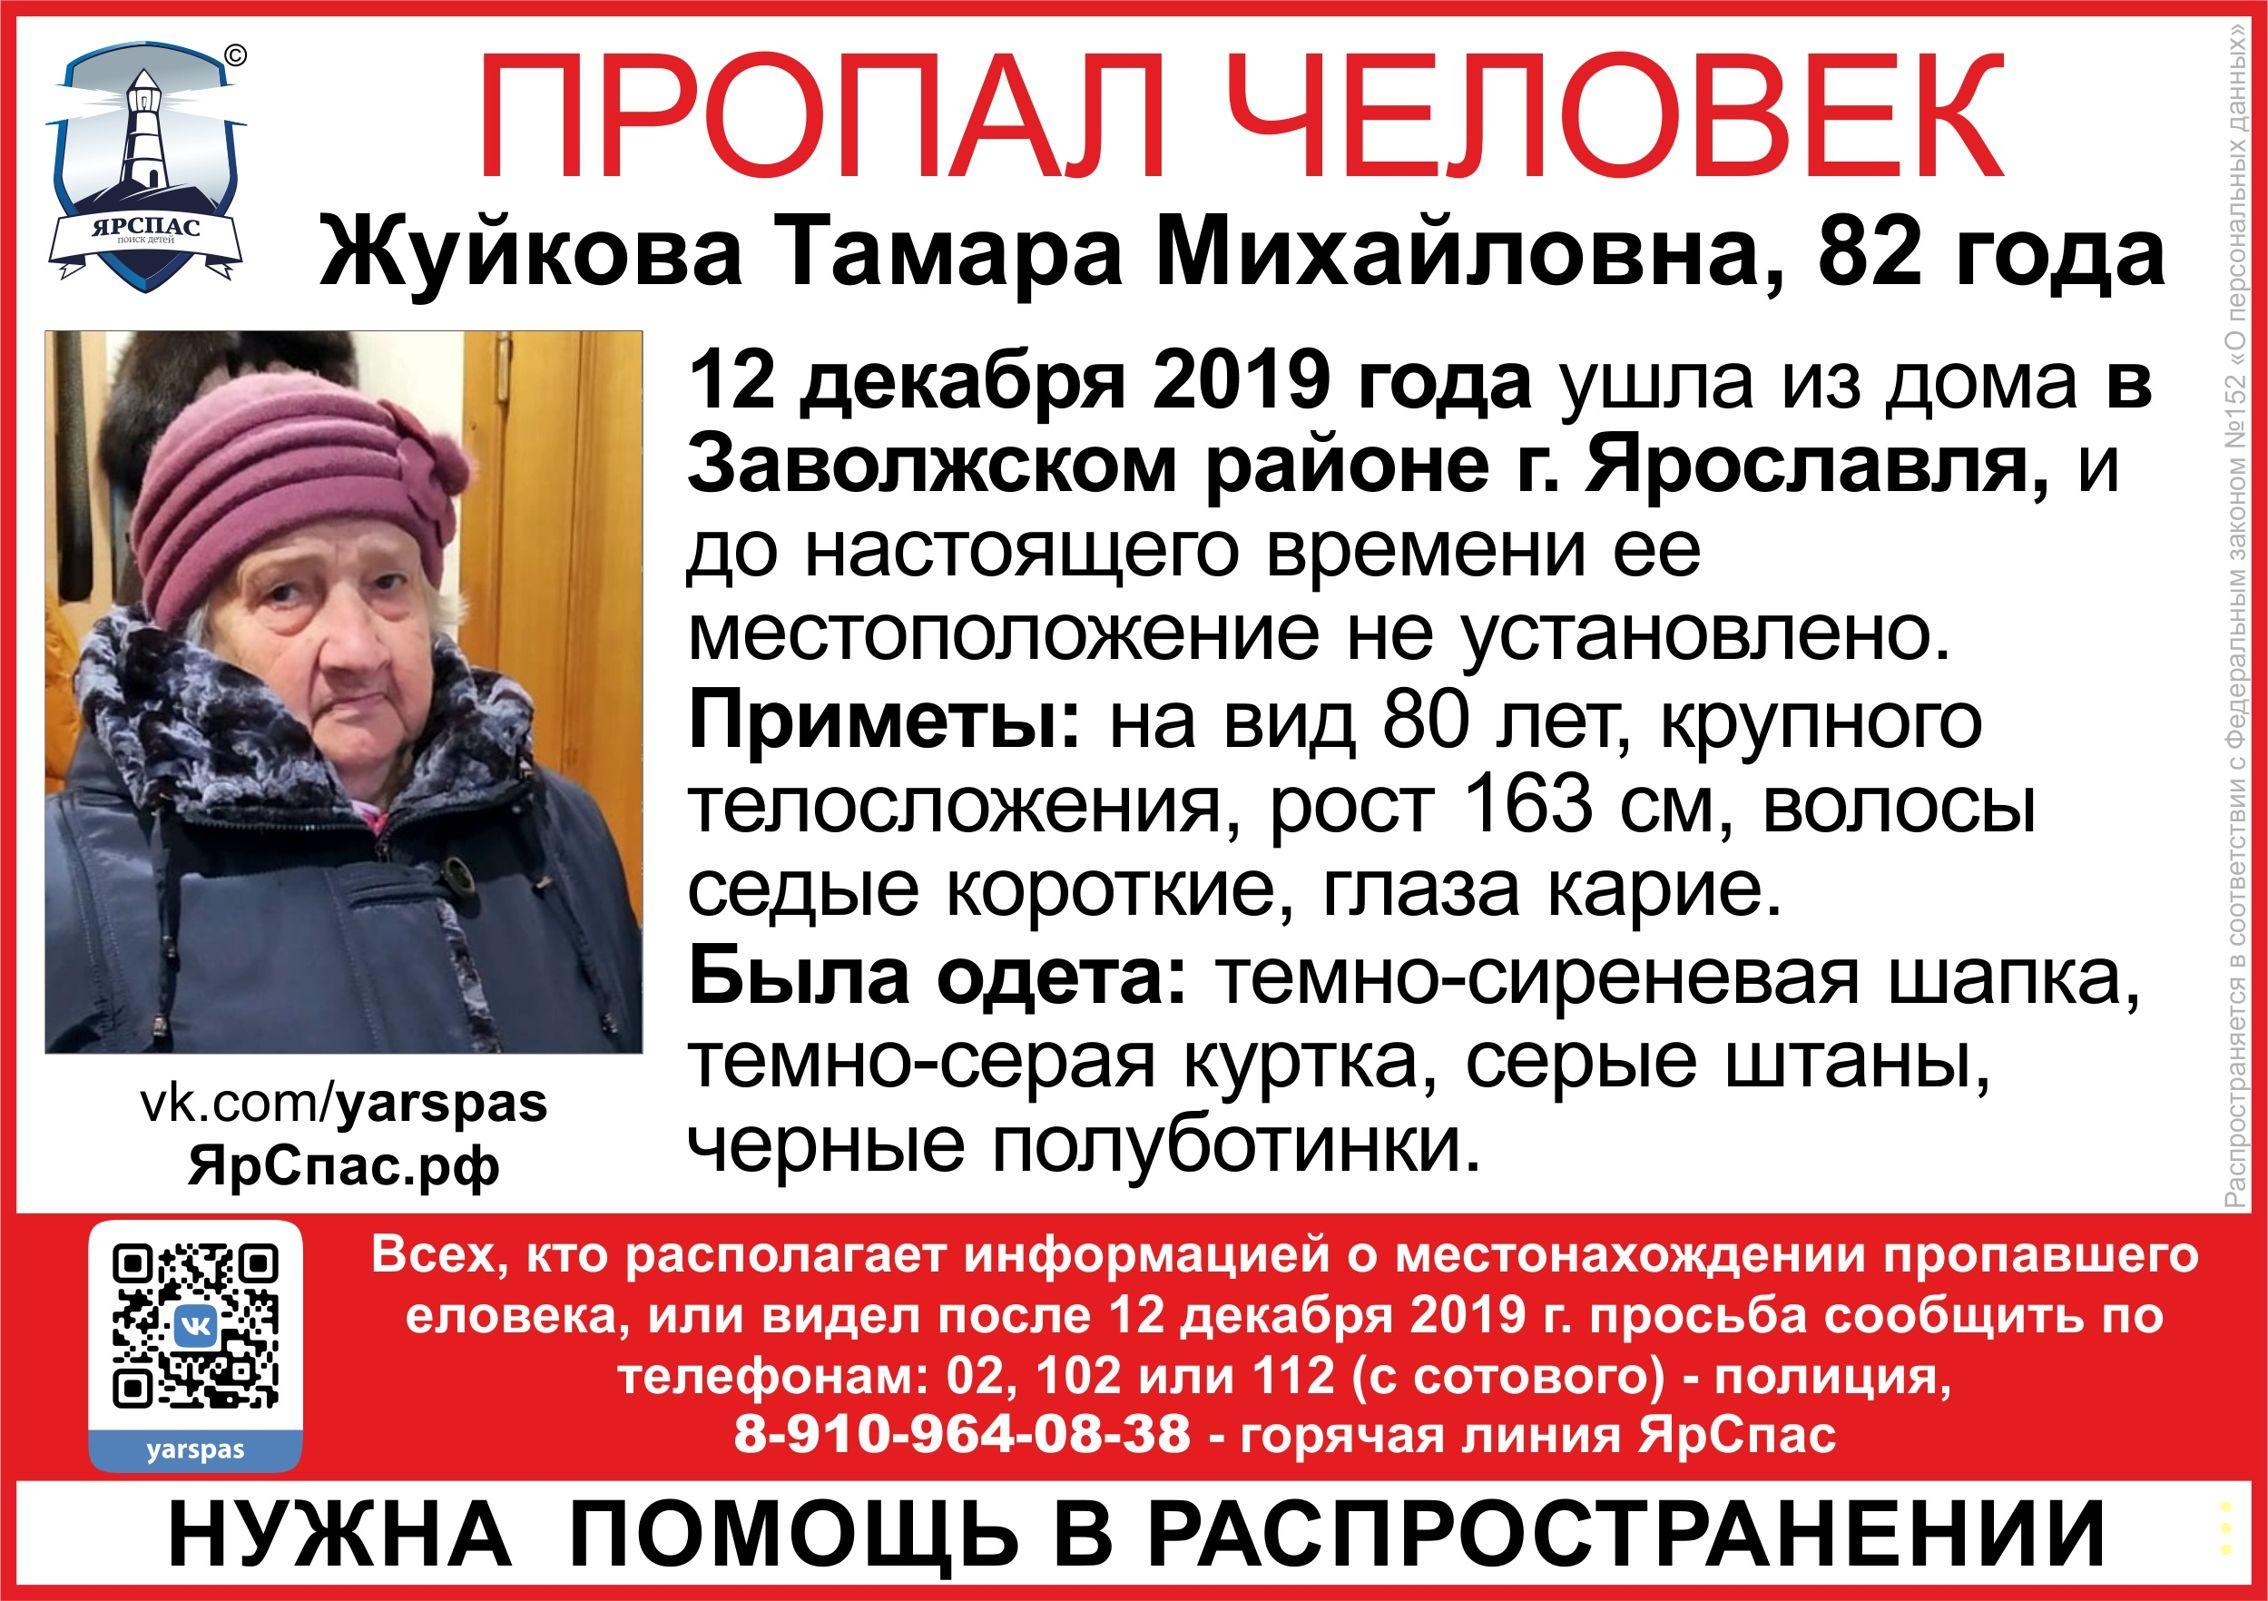 В Заволжском районе Ярославля пропала пенсионерка